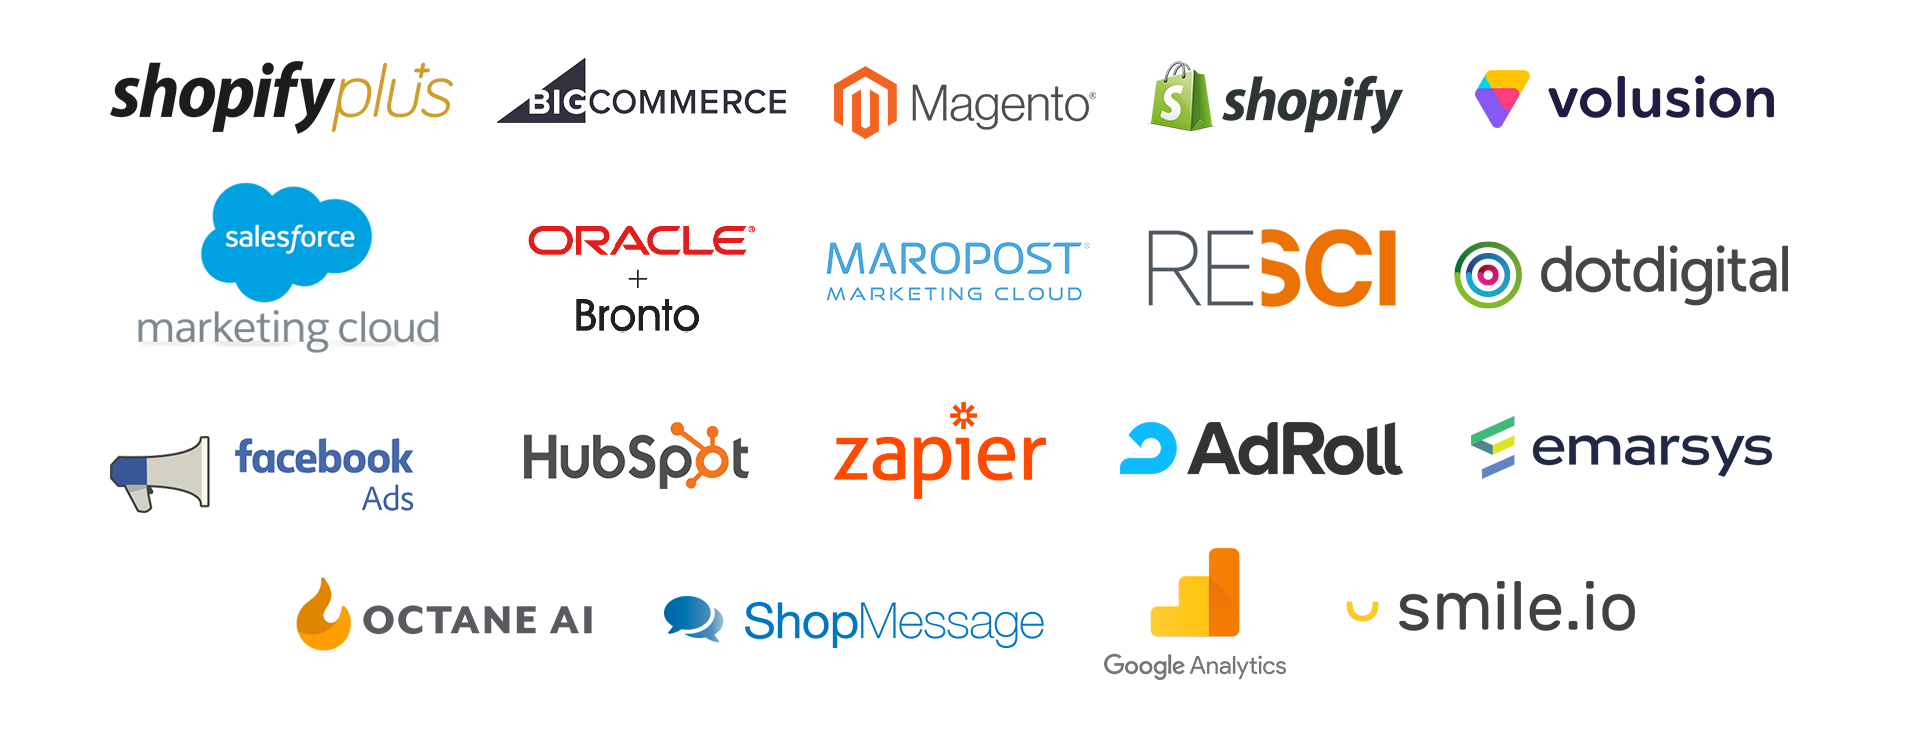 Privy-PDF-Graphics_Ecommerce-Logos